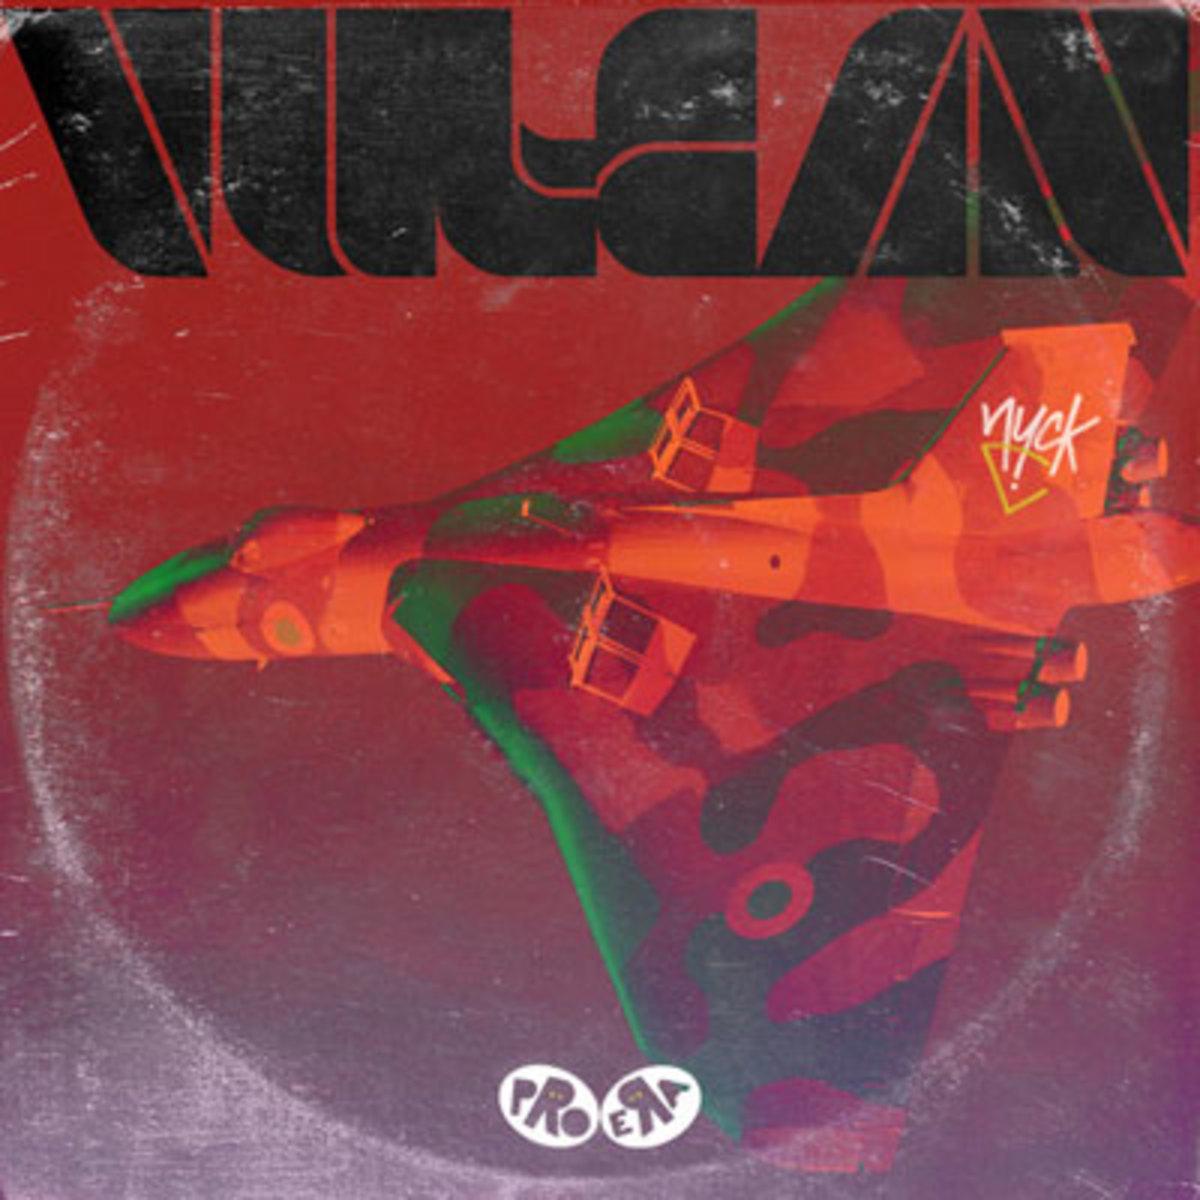 nyck-caution-vulcan.jpg